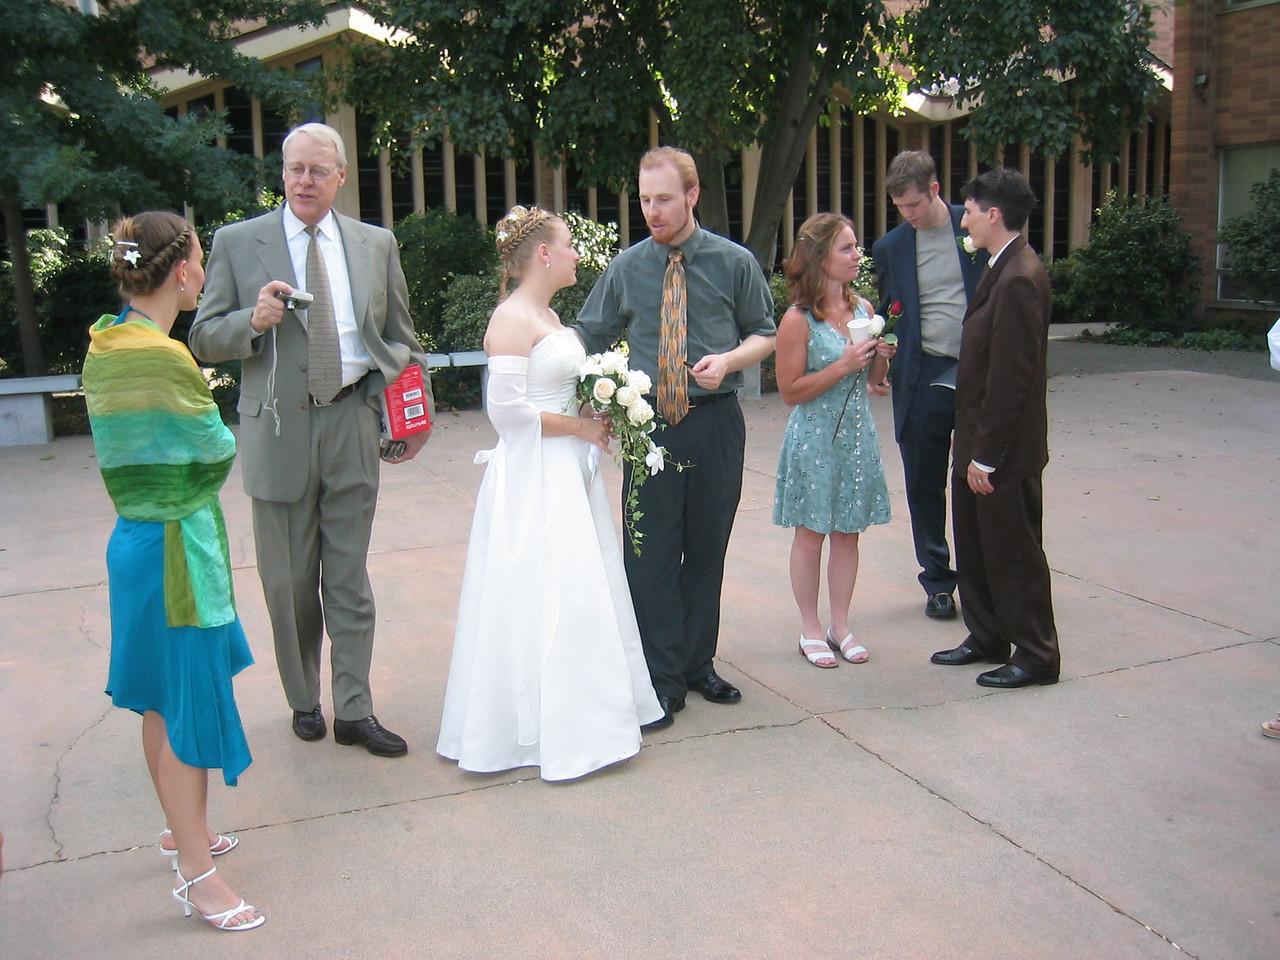 07 - After photo opp - Elizabeth, Mr  Harmon, Michelle, lil' bro' Danny Harmon, 2 people I dunno, & Neil